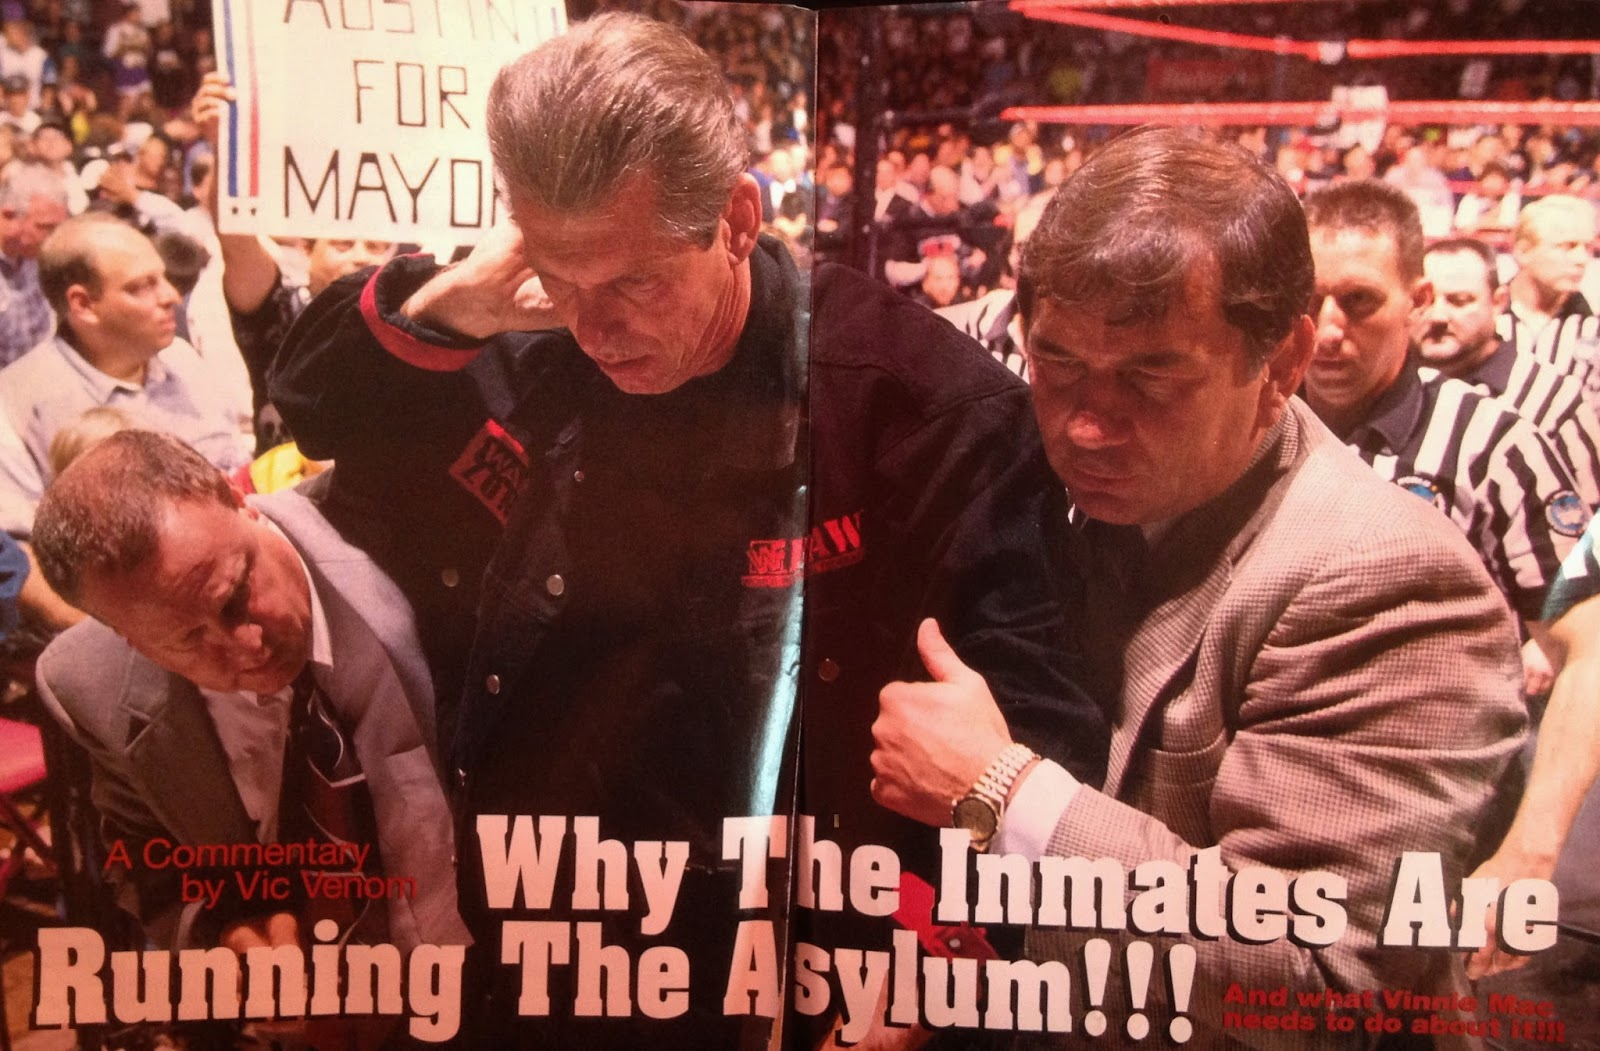 WWE: WWF RAW MAGAZINE - January 1998 - Why the inmates are running the asylum